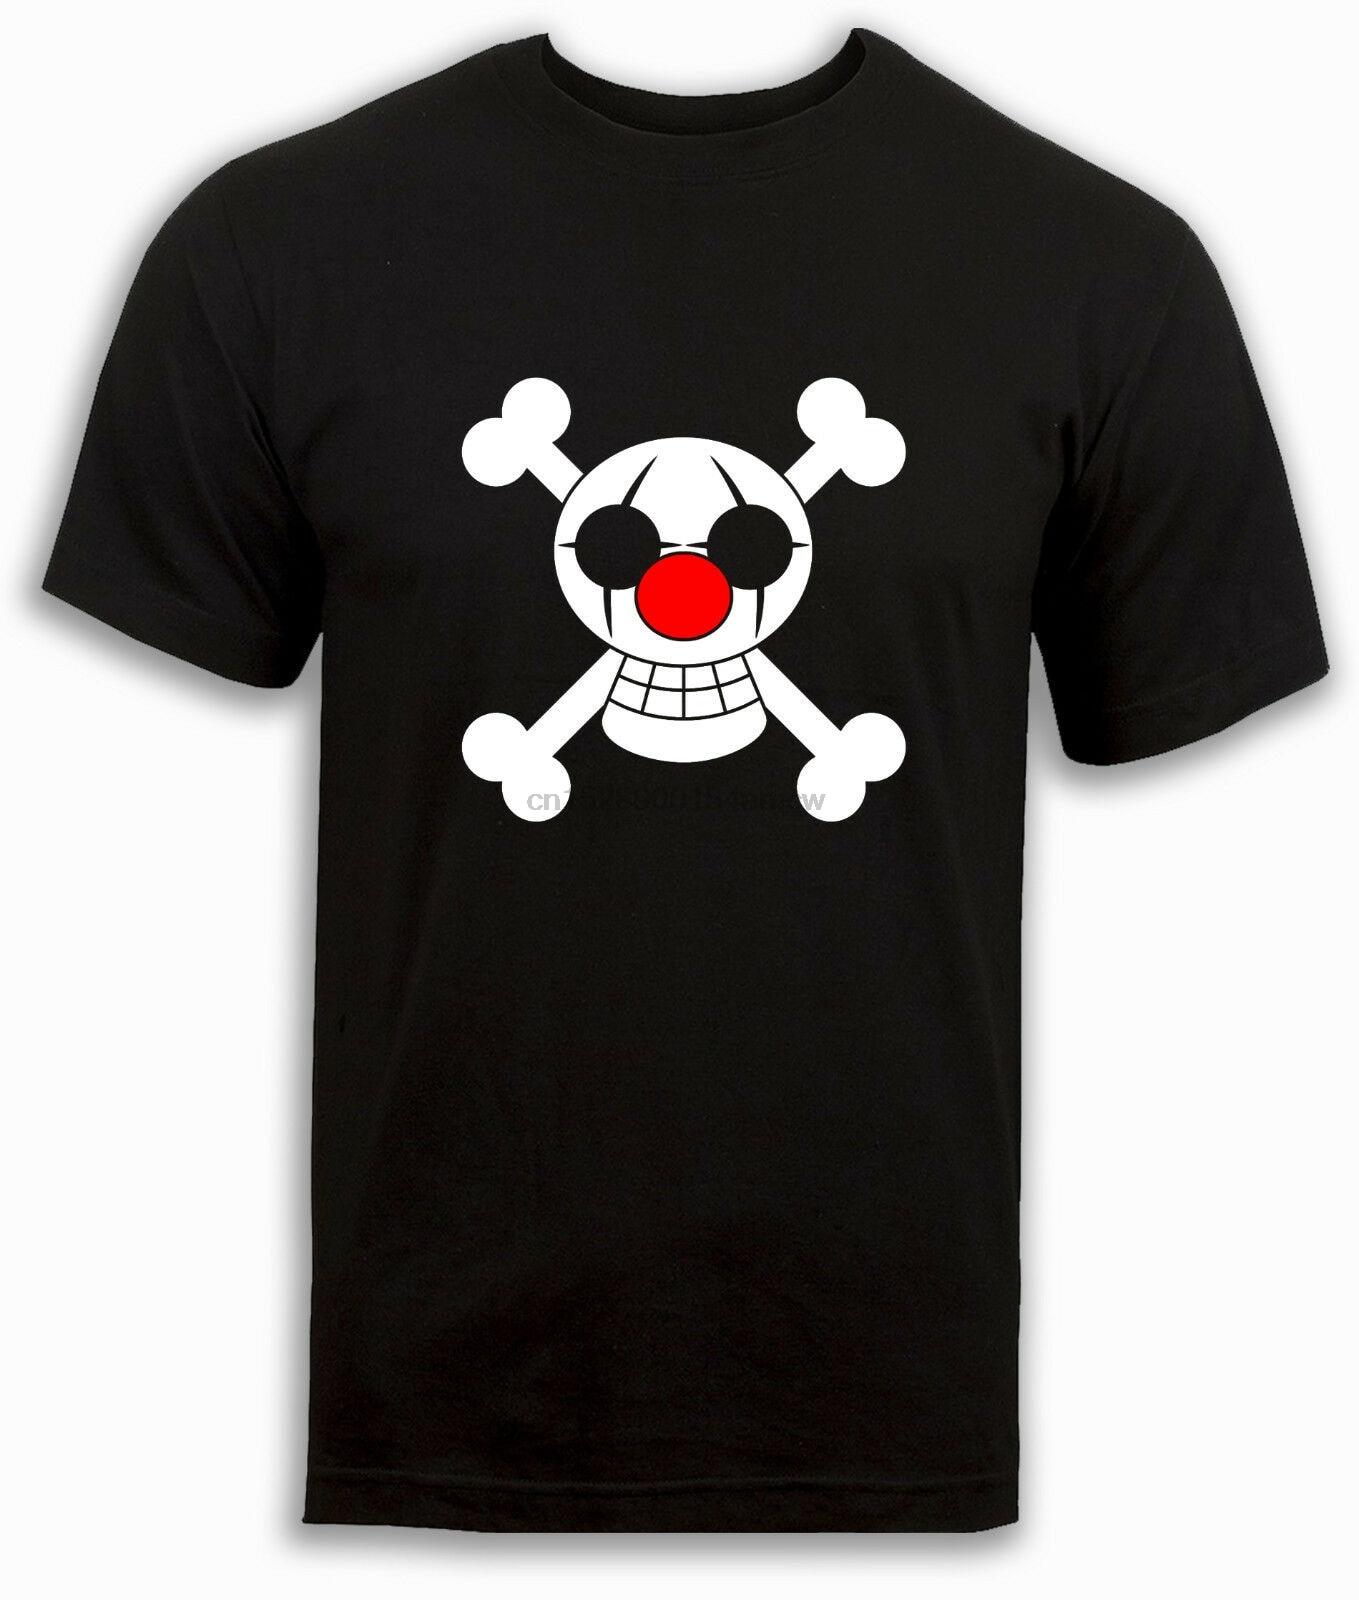 Una pieza camiseta Buggy piratas payaso pirata bandera Anime negro Top hombres S a 2XL